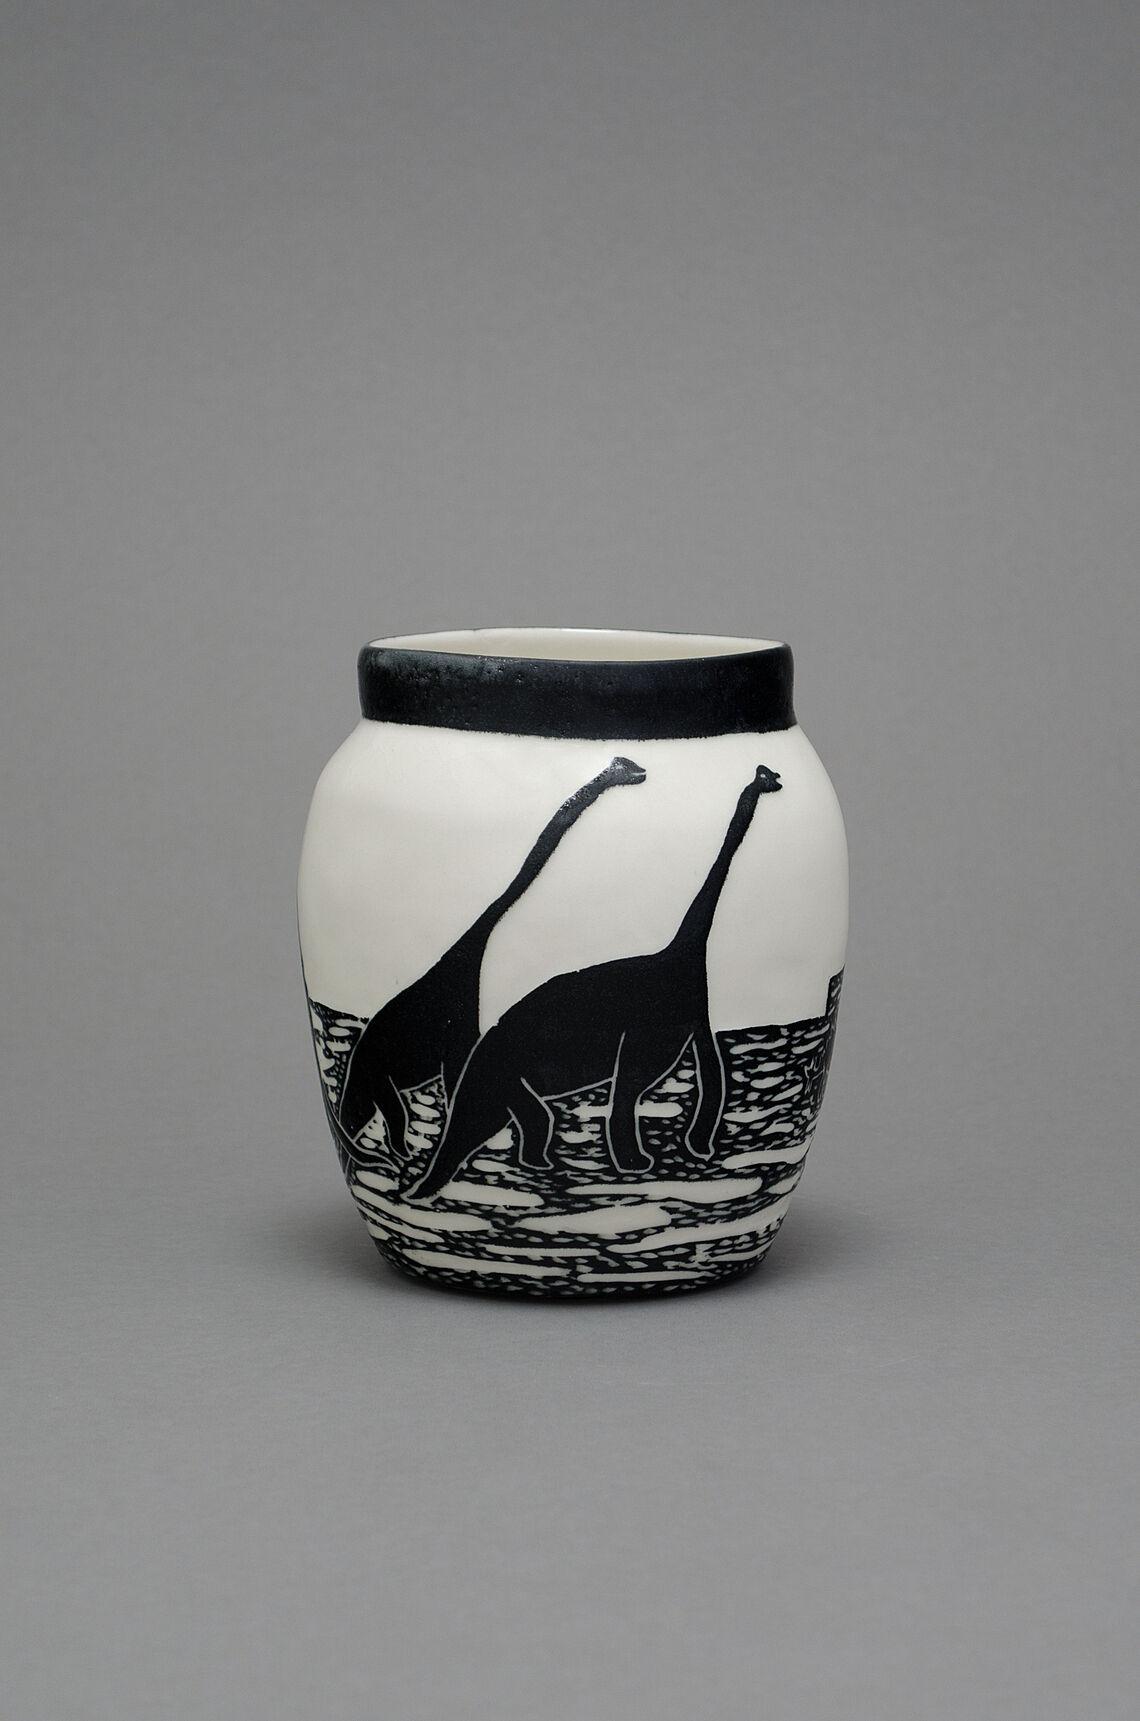 A porcelain pot of black and white dinosaur paint